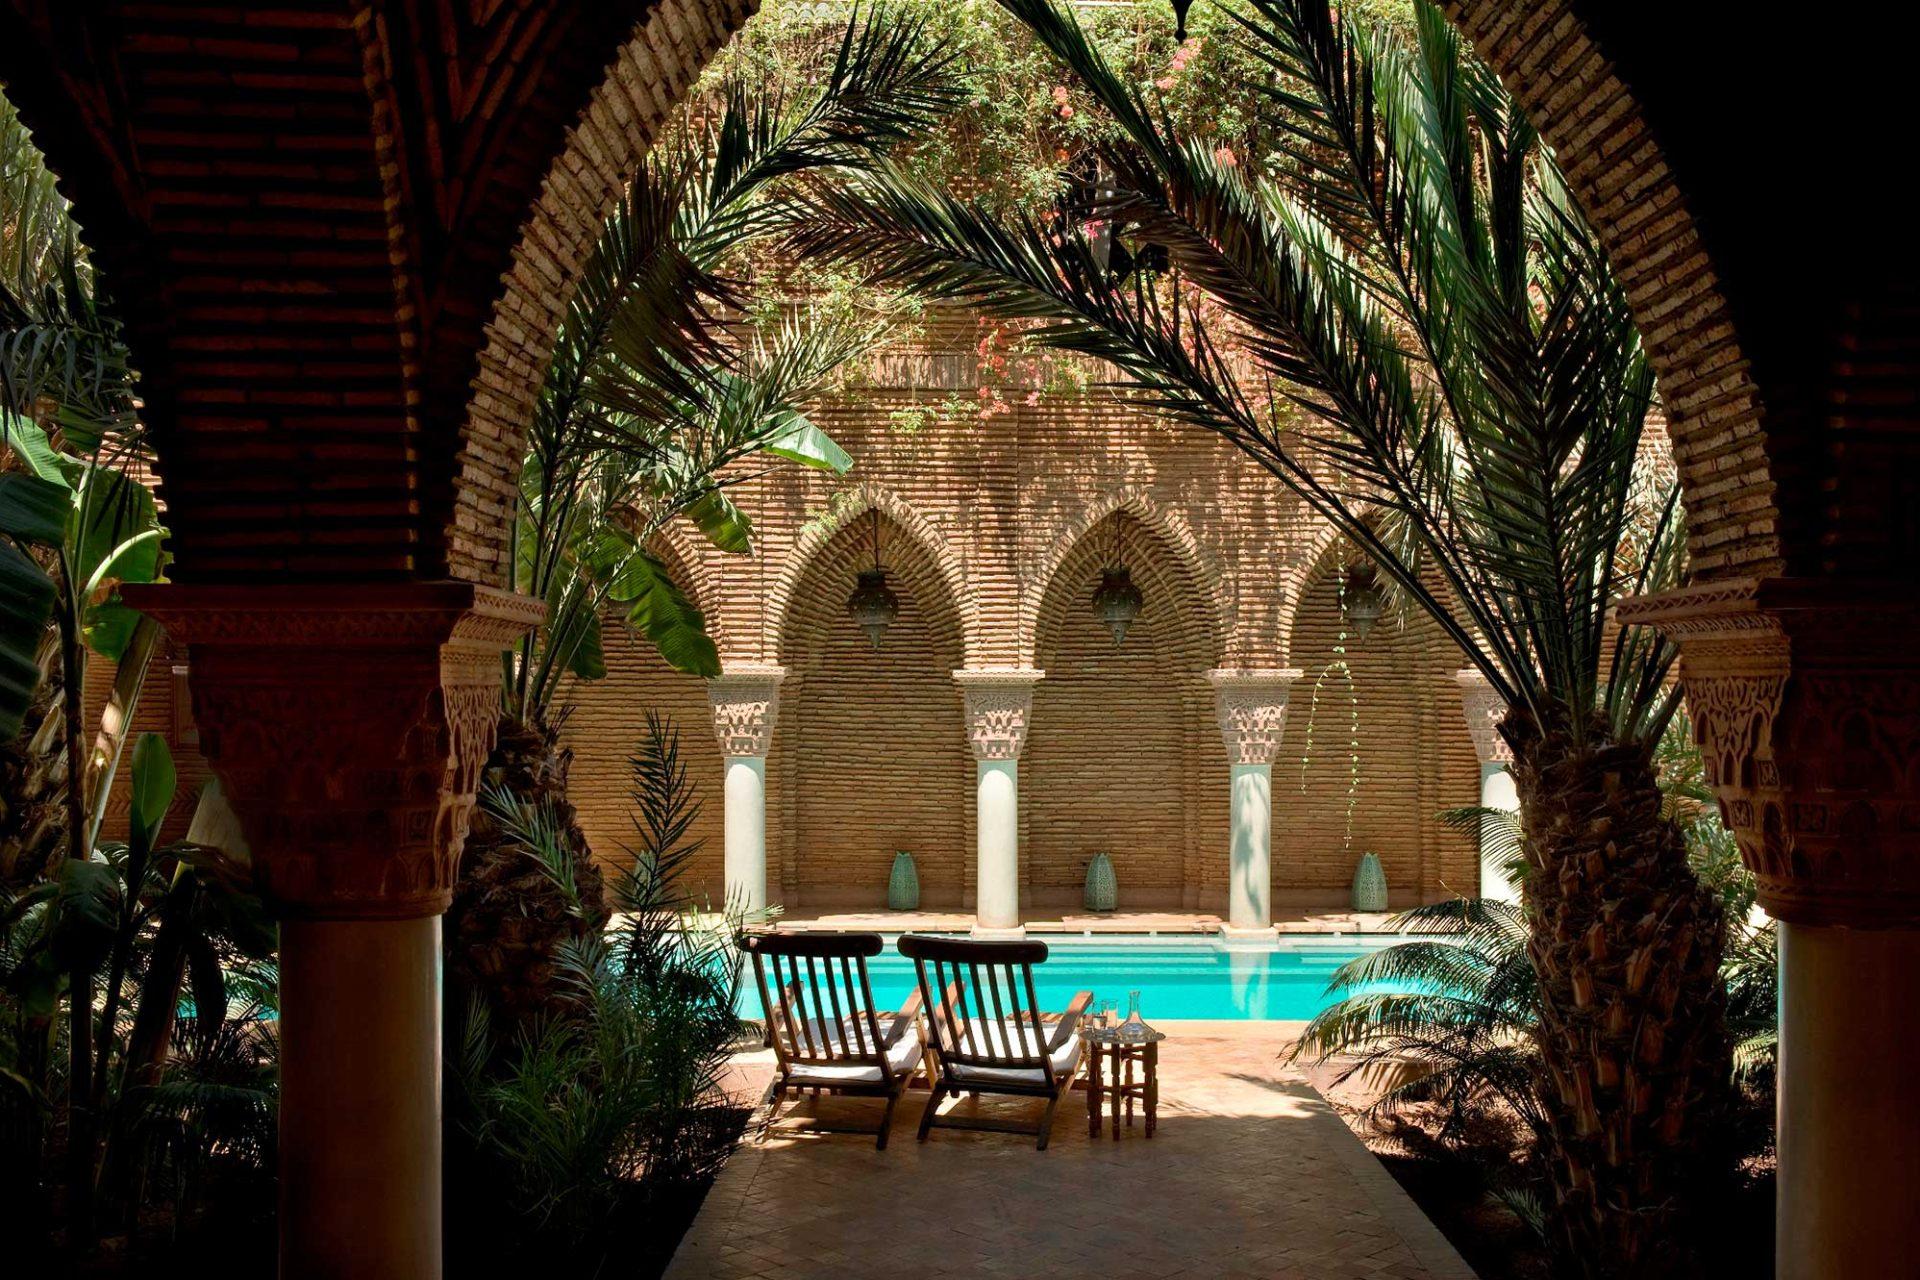 A beautiful pool in a riad in marrakesh